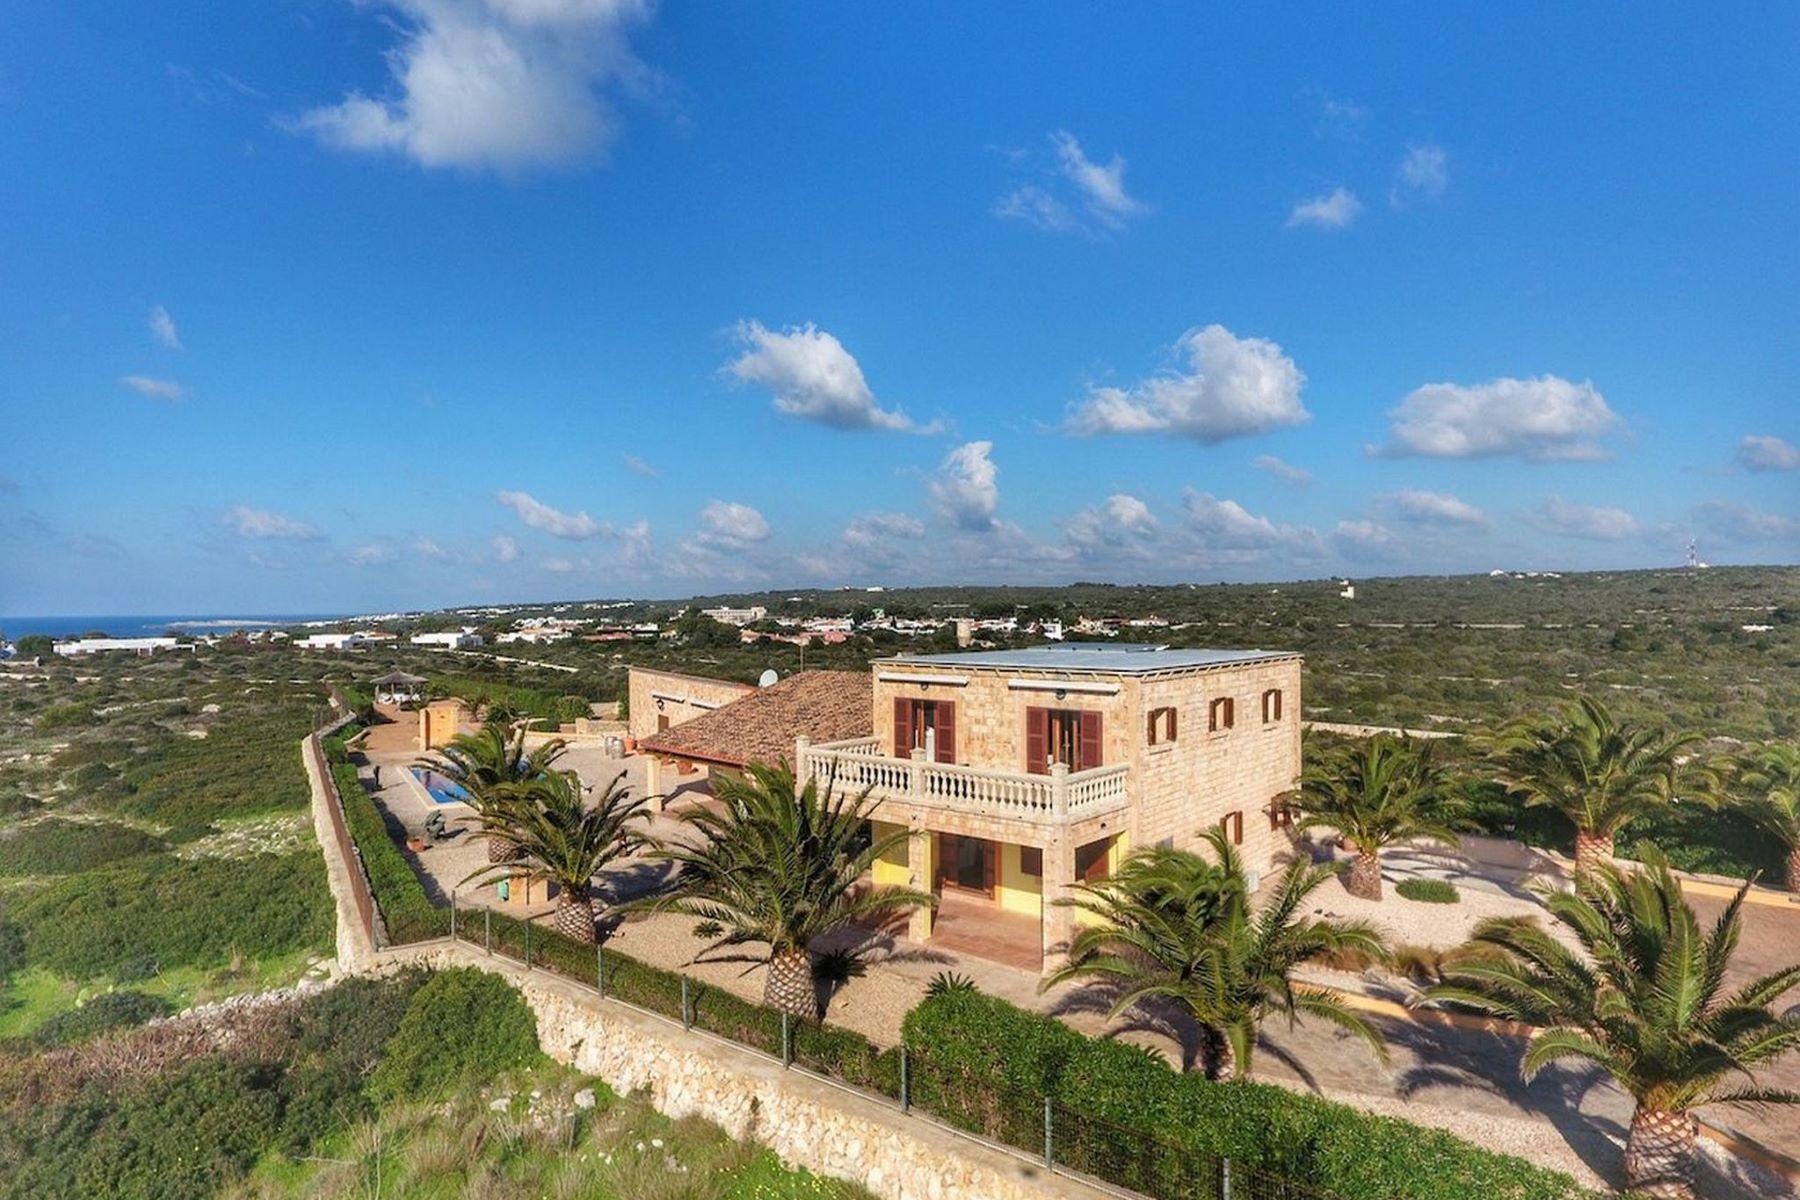 Single Family Home for Sale at Luxury Estate in Punta Prima with superb sea views Menorca, Menorca Spain